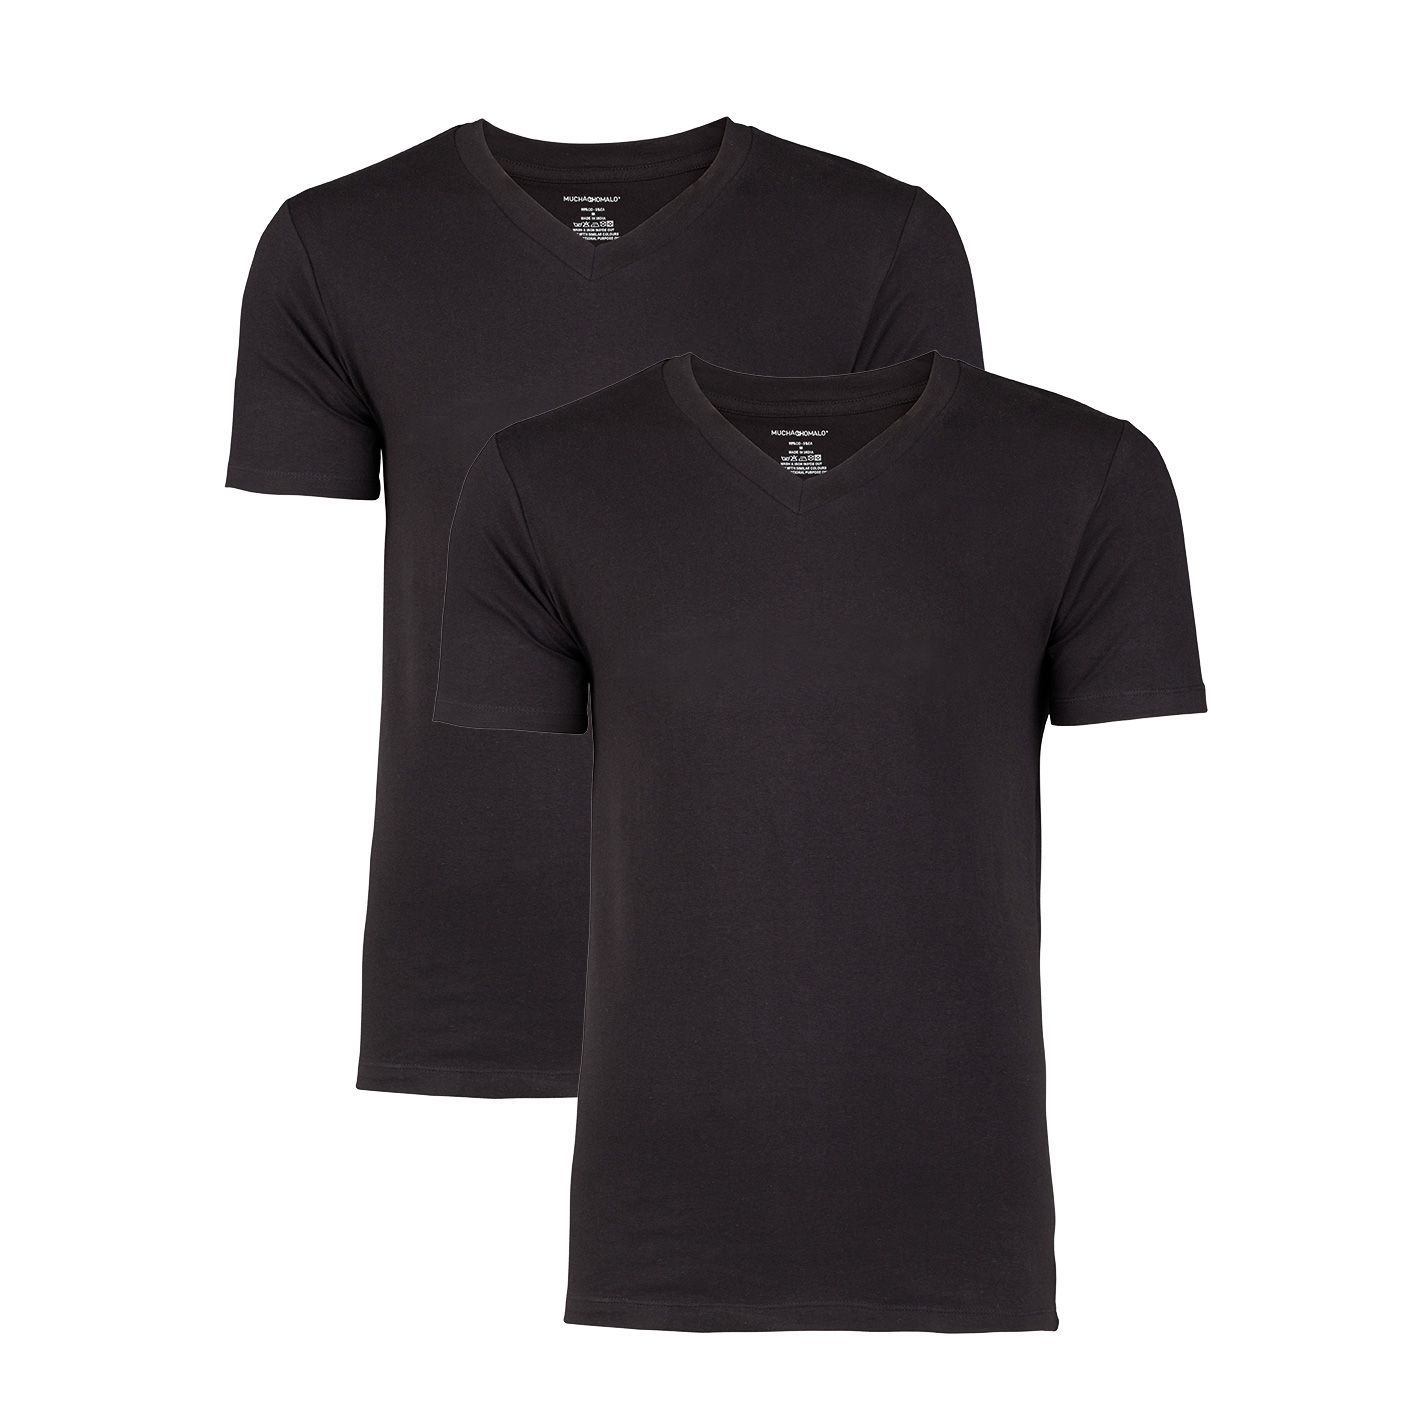 Muchachomalo 2-pack Men T-shirt Zwart-S